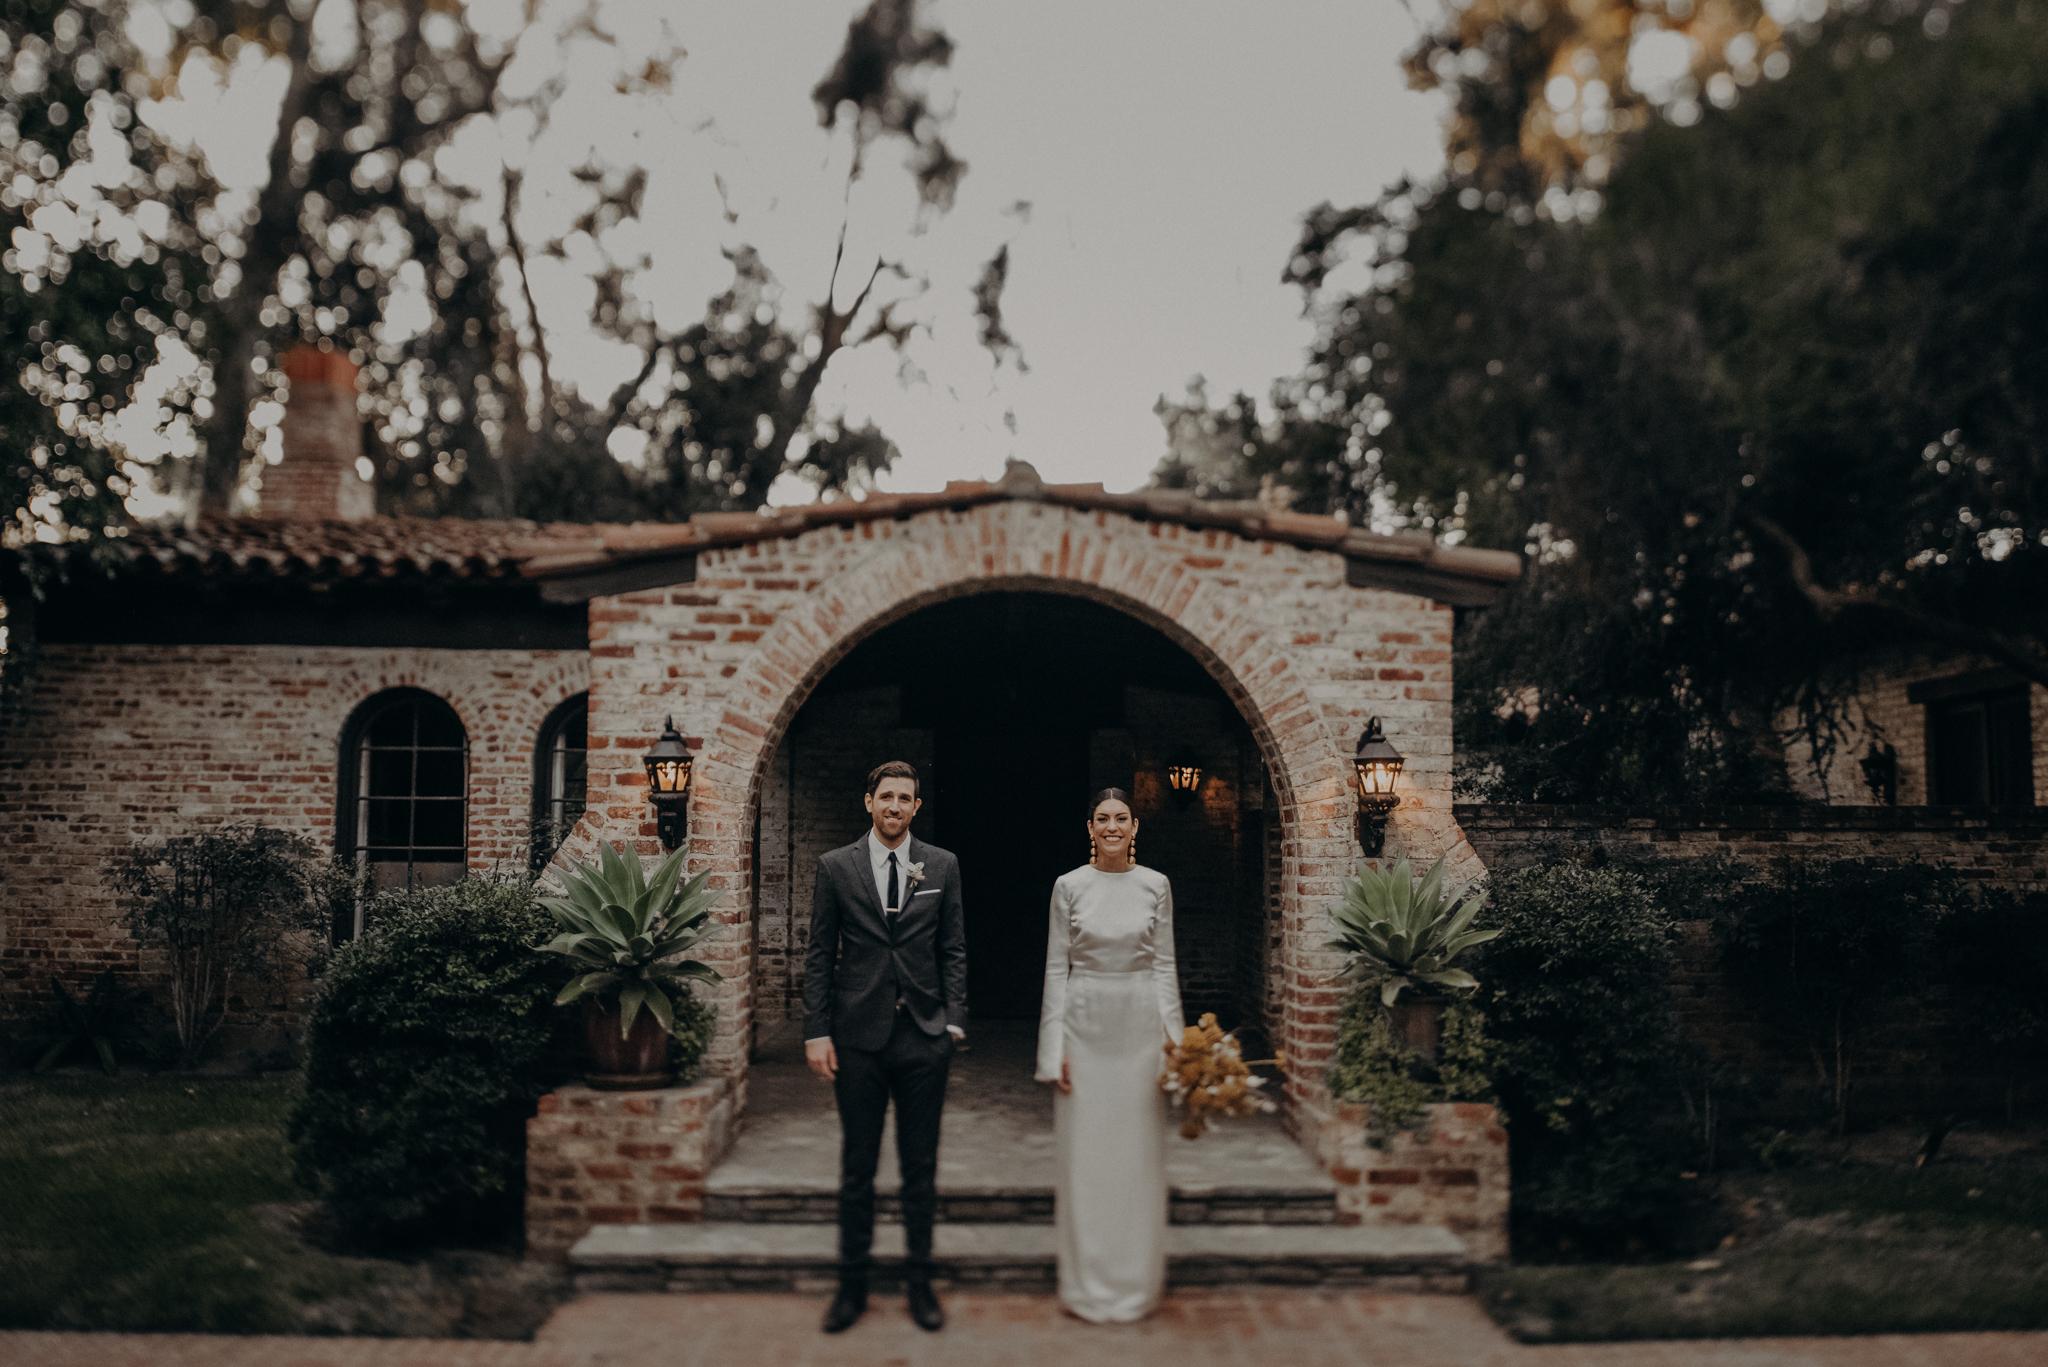 Hummingbird+Nest+Ranch+Wedding+-+Wedding+Photographer+in+Los+Angeles+-+IsaiahAndTaylor.com-080.jpg